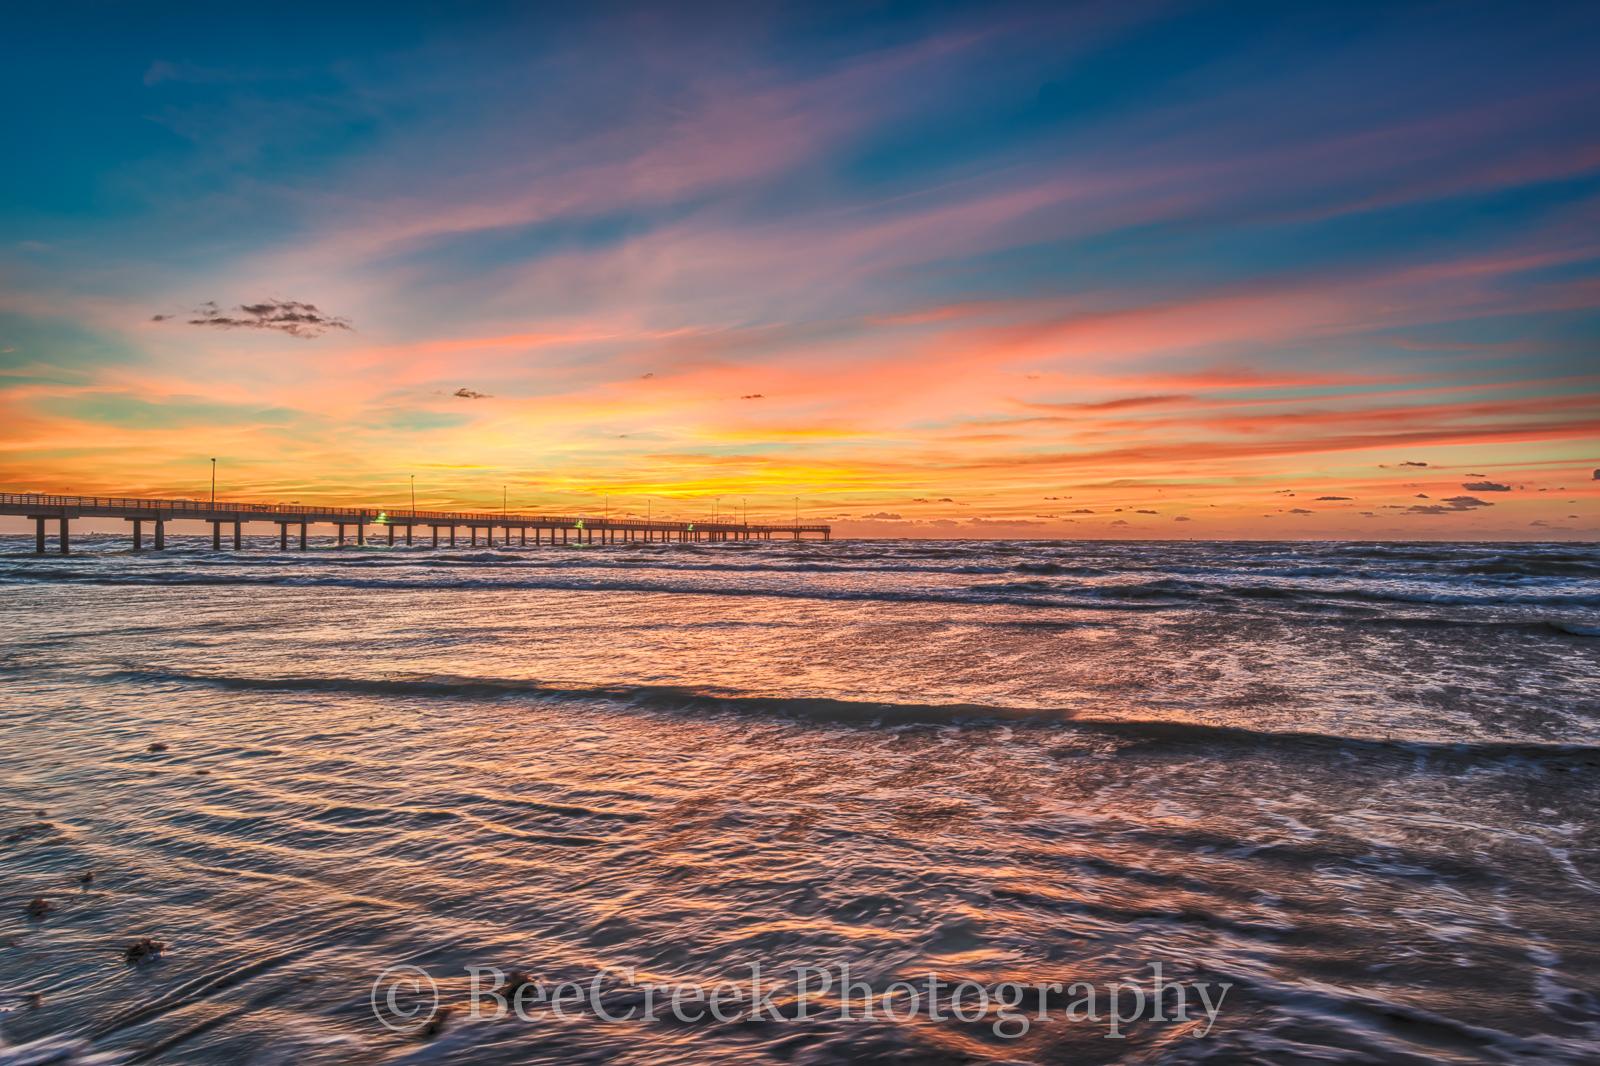 Caldwell pier, Port Aransas, Sunrise, Texas Coast, coastal, fishing, gulf of mexico, ocean beach, ripples sand, sea weeds, seascape, shore, surf, texas beaches, texas gulf, waves, photo